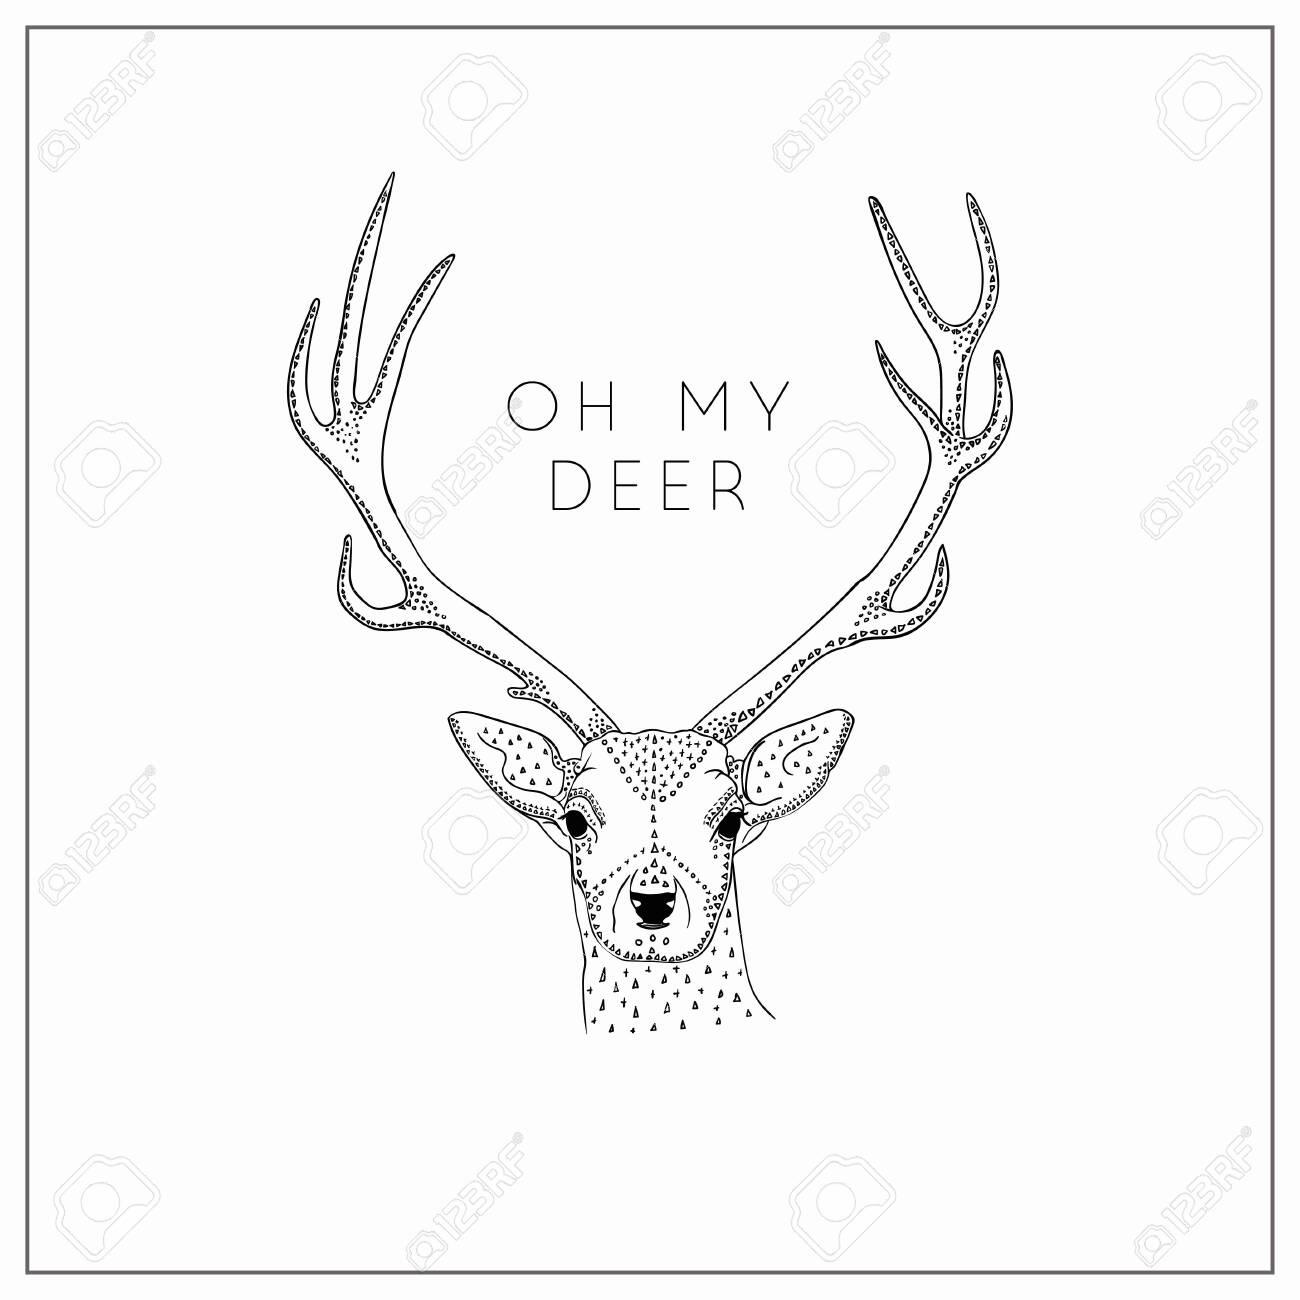 Vector Hand Drawn Deer Head Logo Tattoo Illustration With Horns